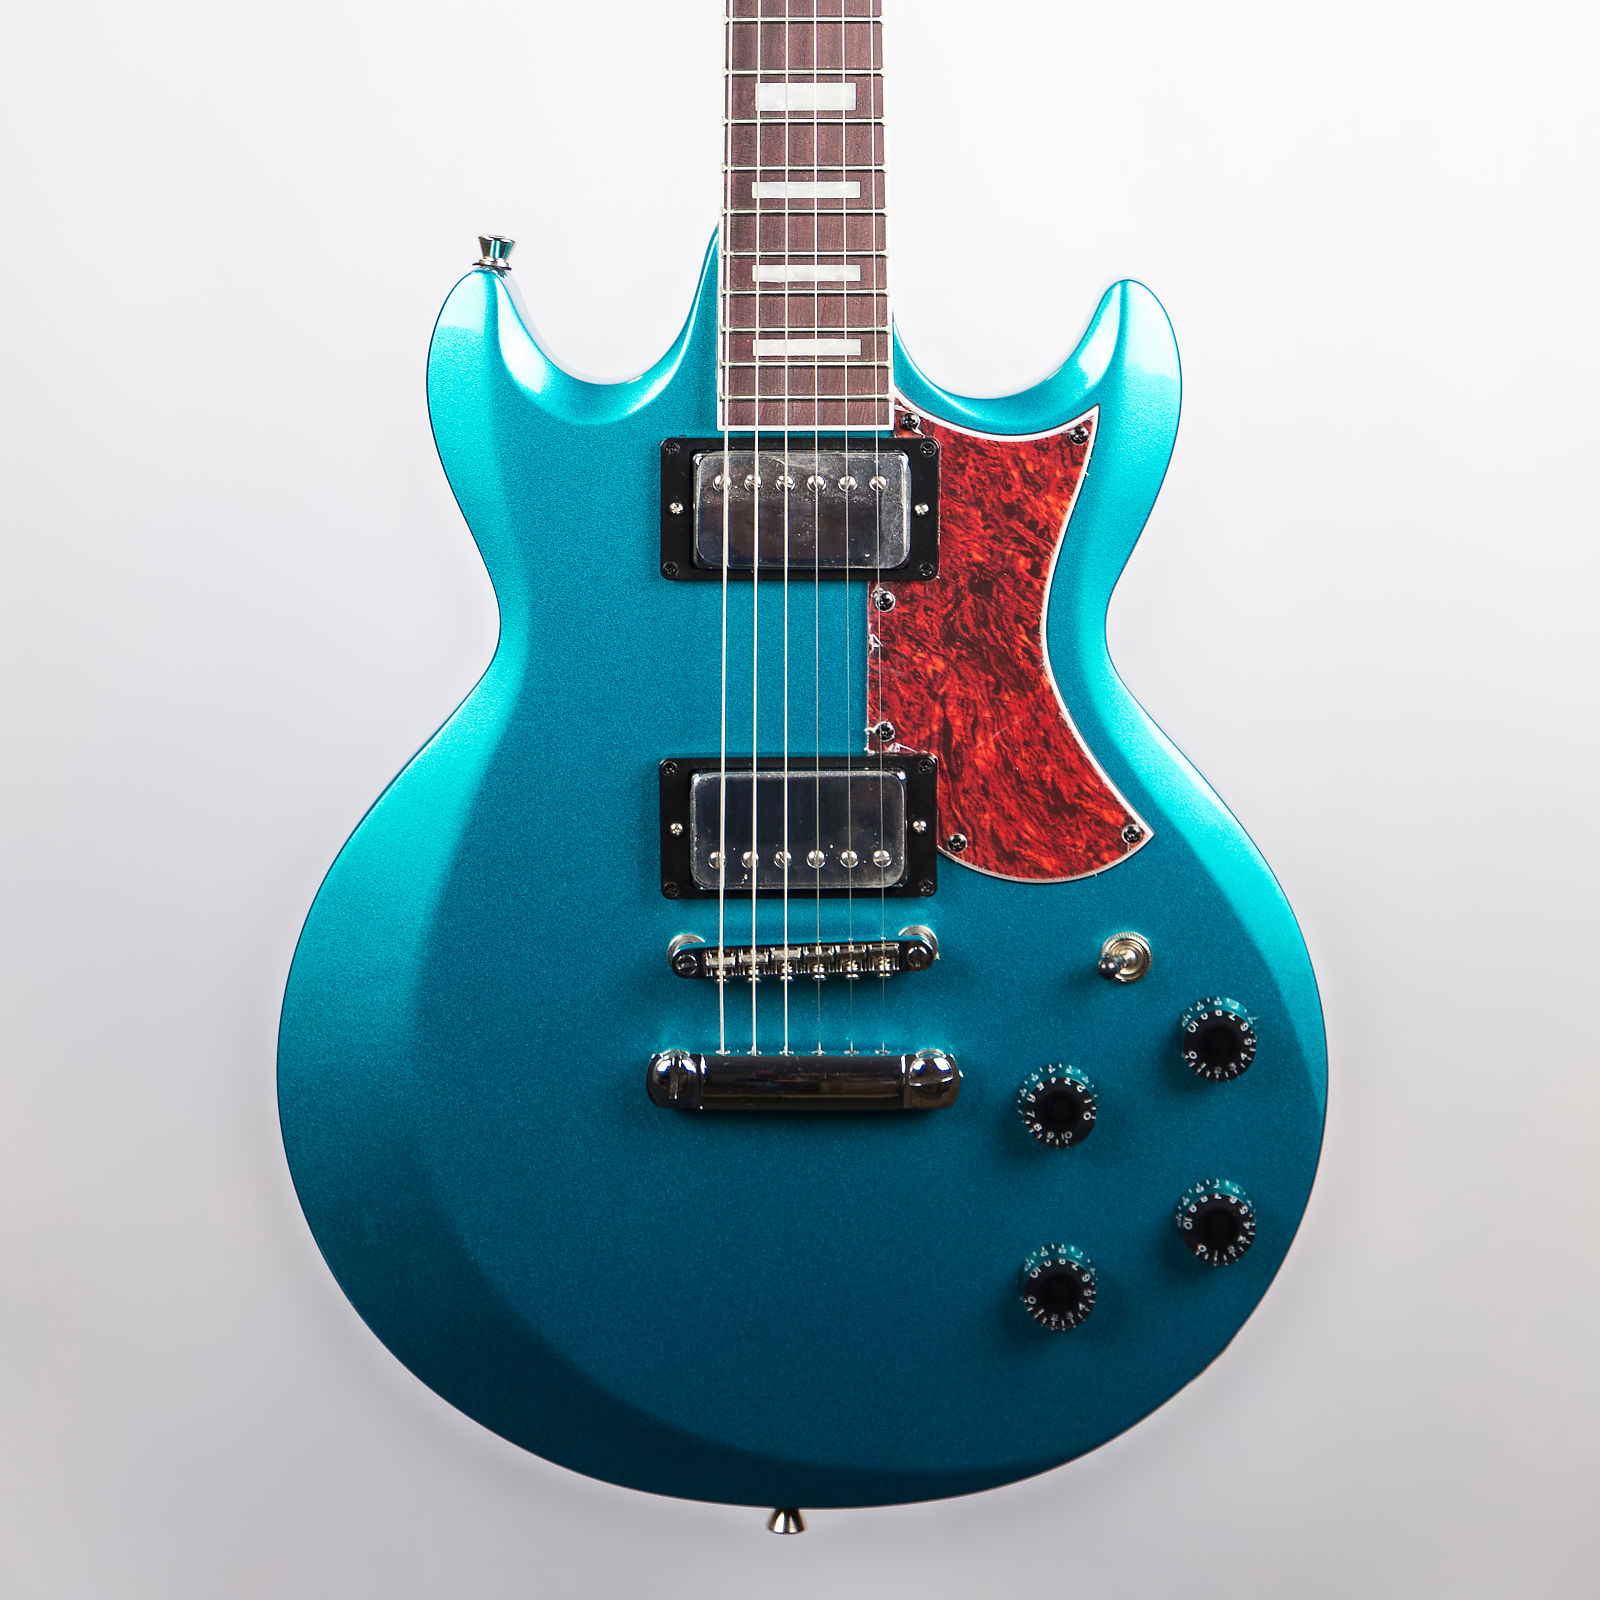 Ibanez Ax120 Electric Guitar In Metallic Light Blue